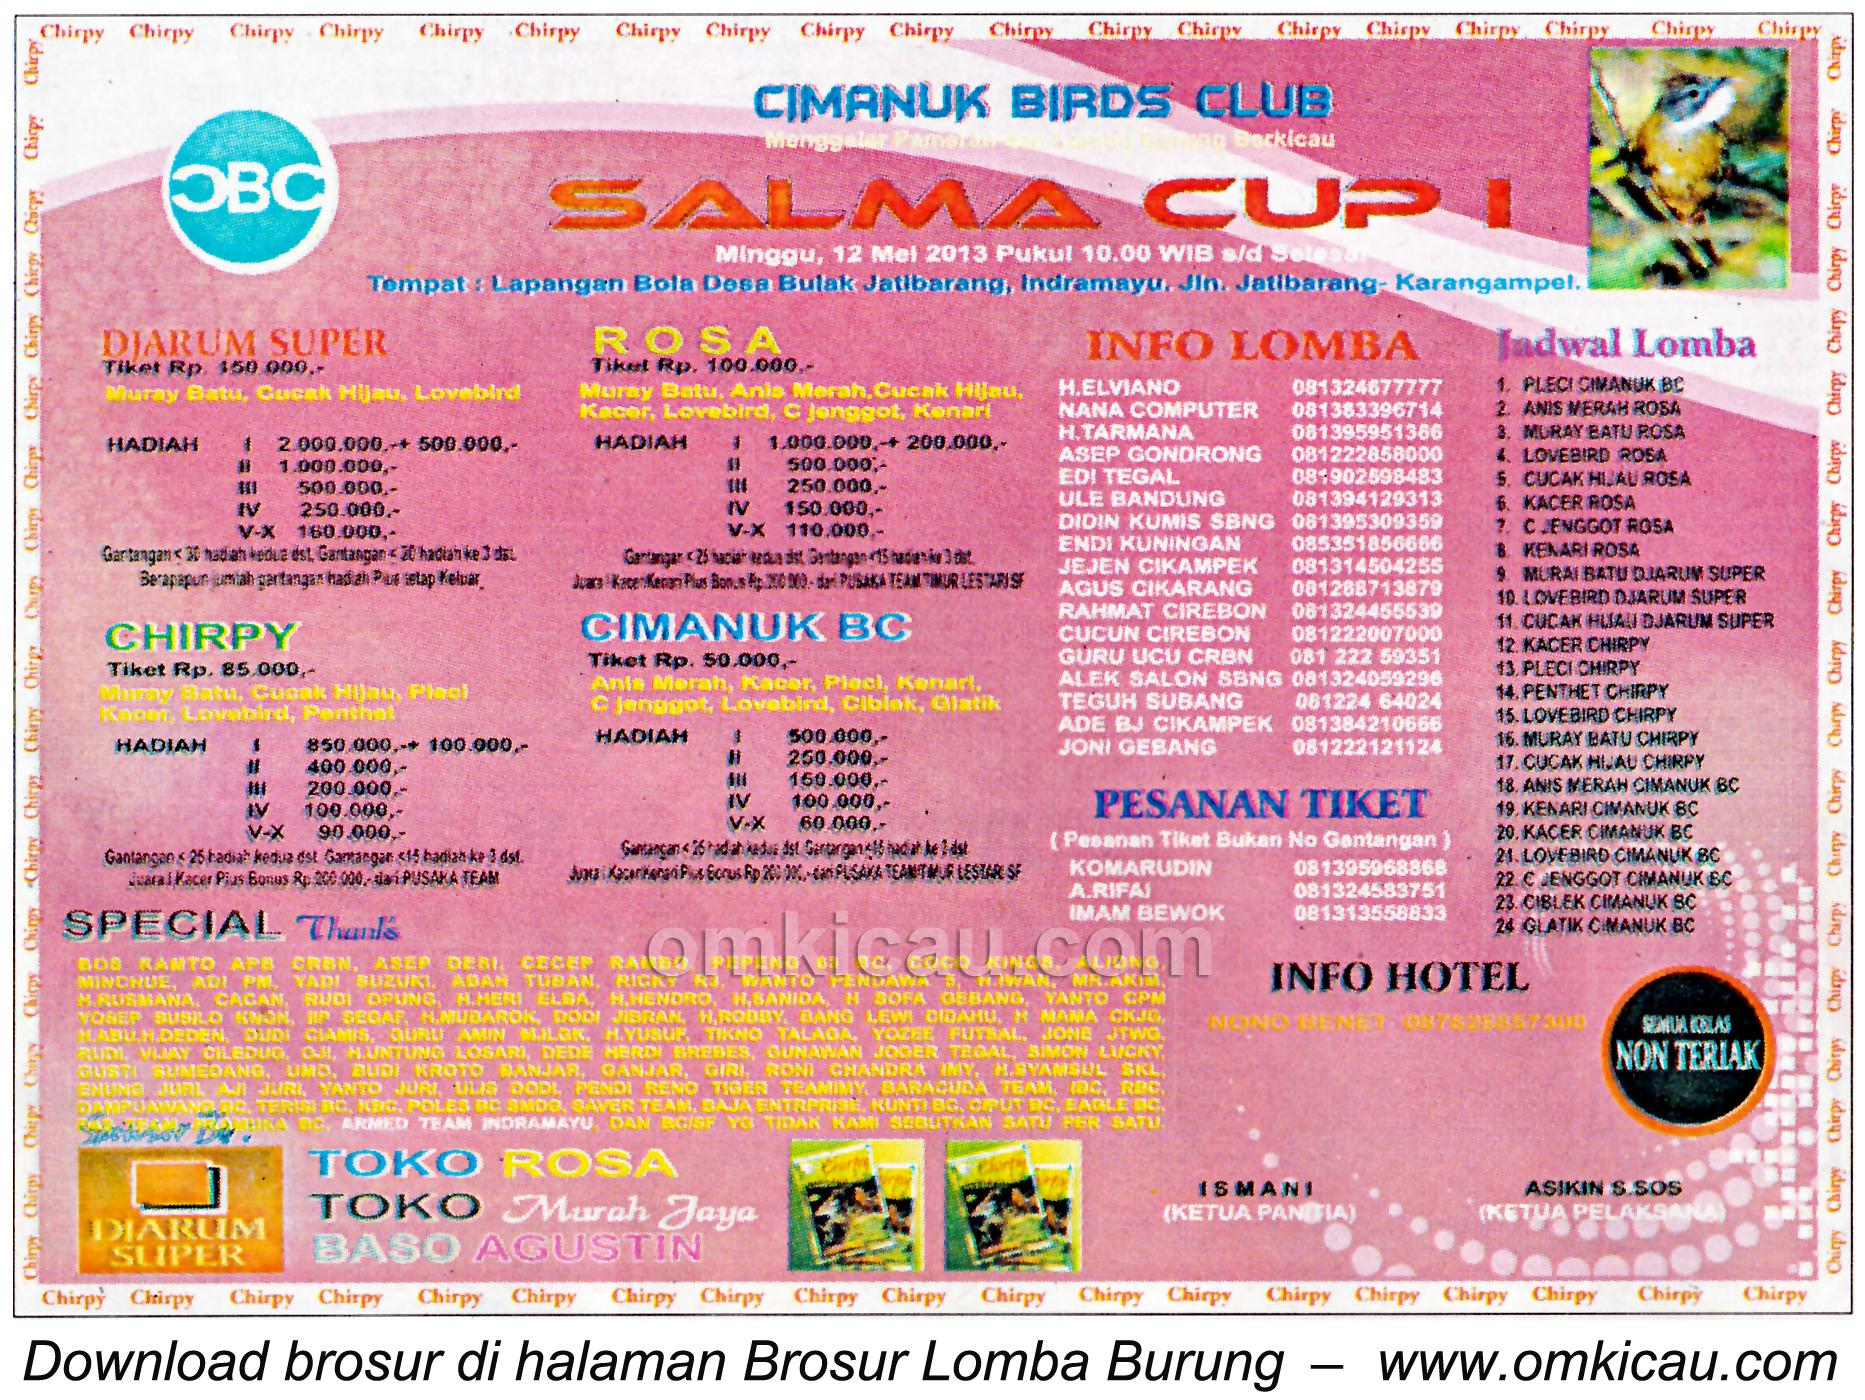 Brosur Lomba Burung Salma Cup - Indramayu - 12 Mei 2013